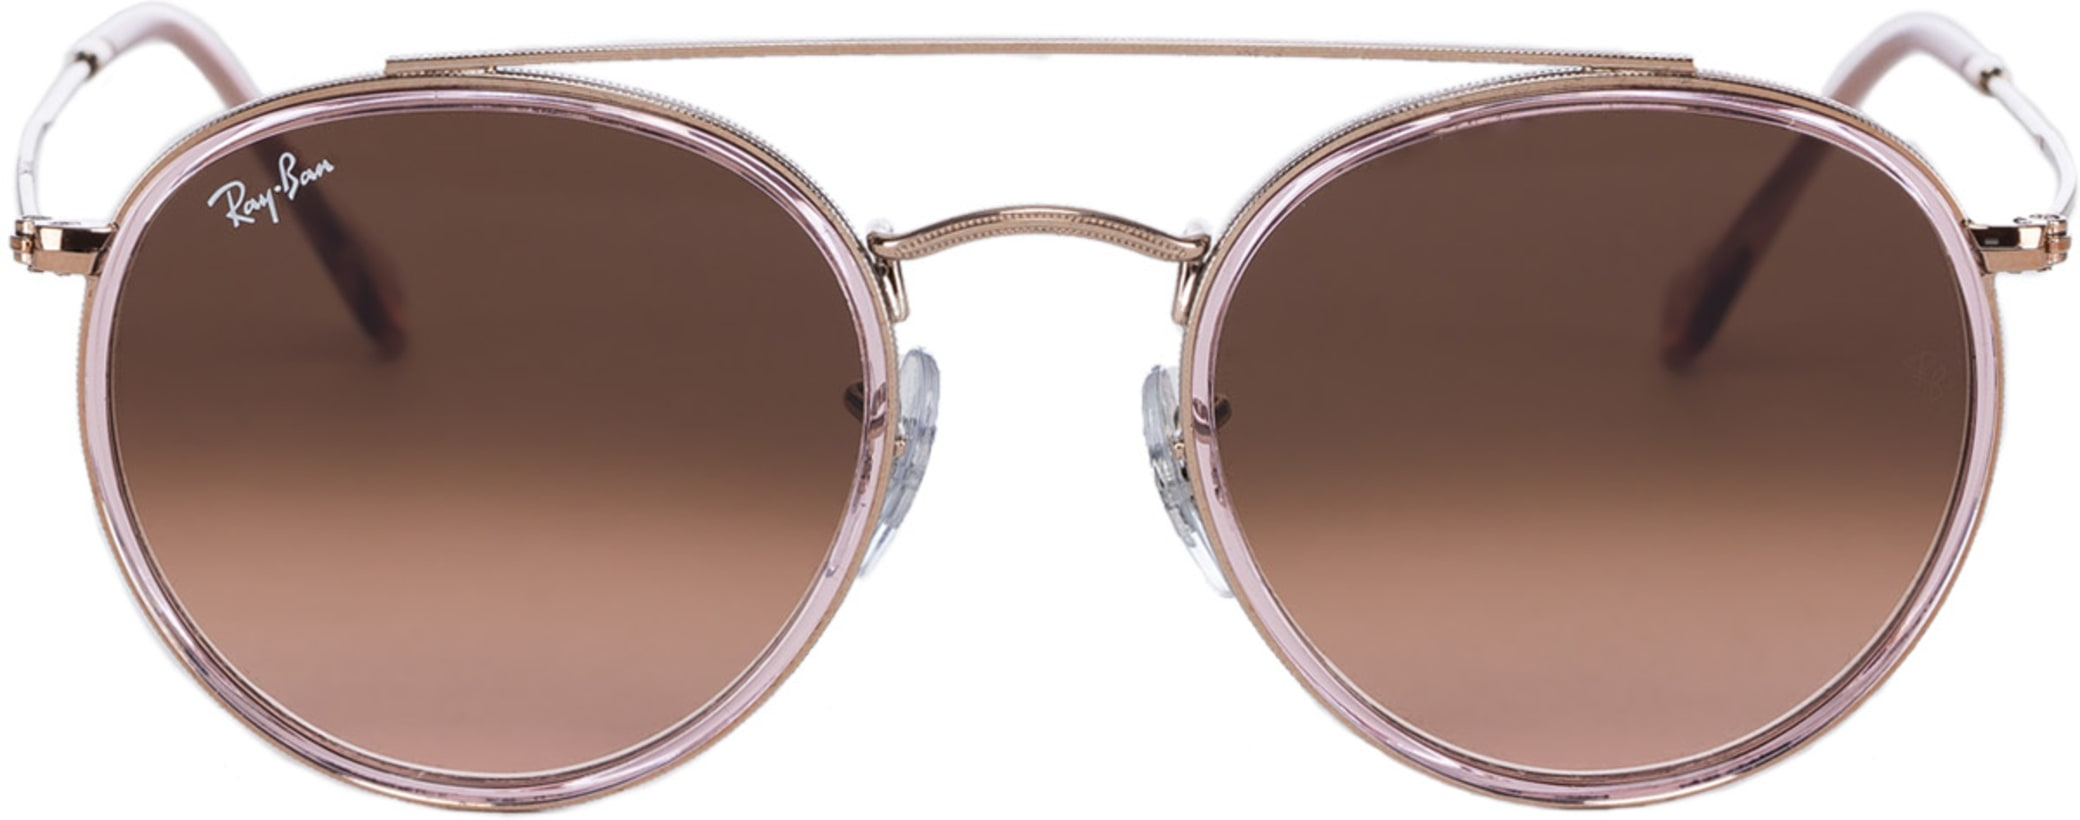 3ba56fb253 Ray-Ban. Round Double Bridge Sunglasses - Pink Bronze Copper Brown Gradient